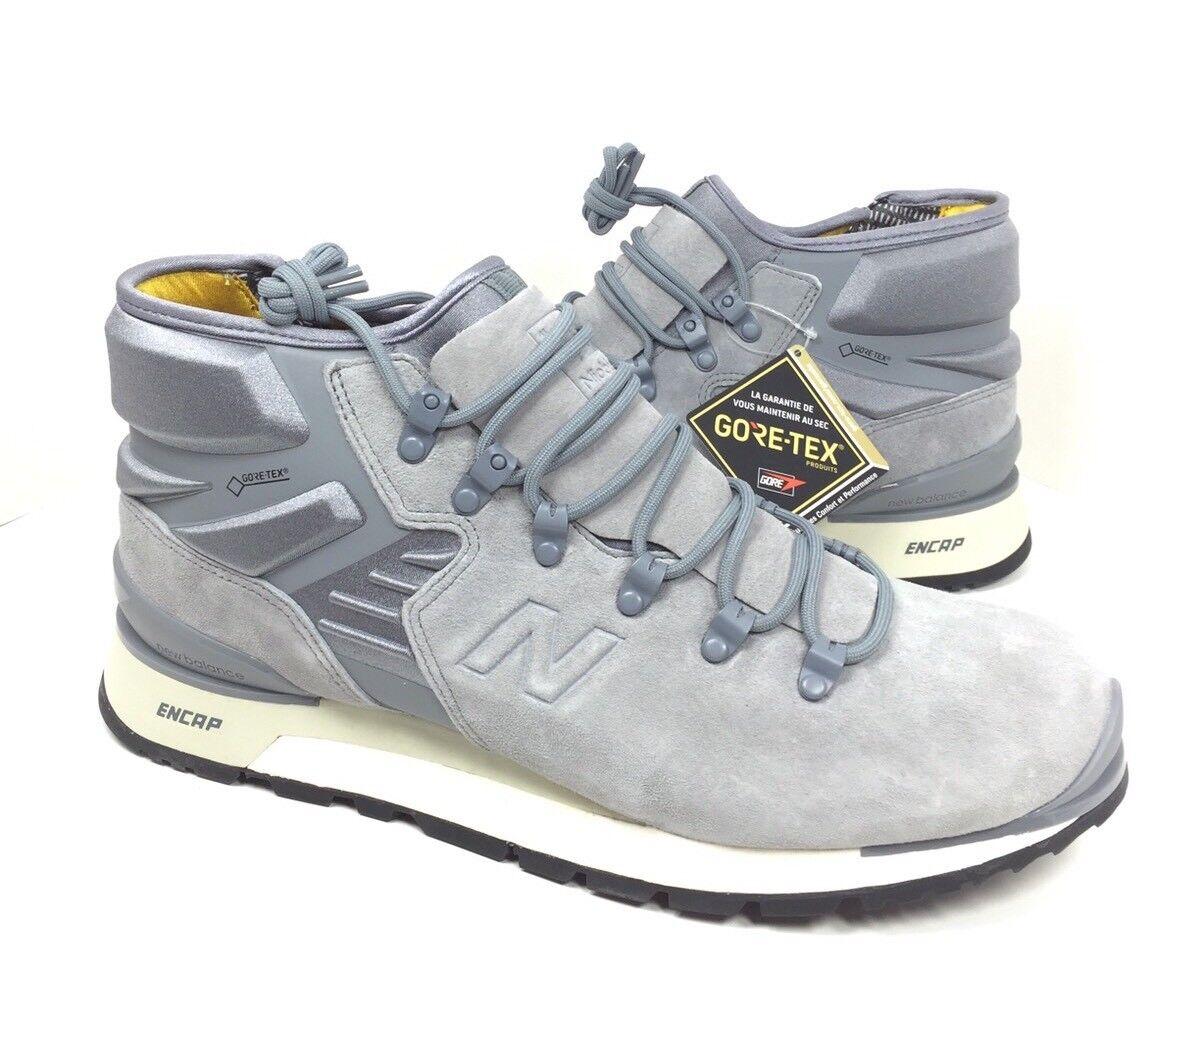 NEW New Balance Mens Niobium Grey White Black Mid Sneaker Shoes MLNBDCC Size 12